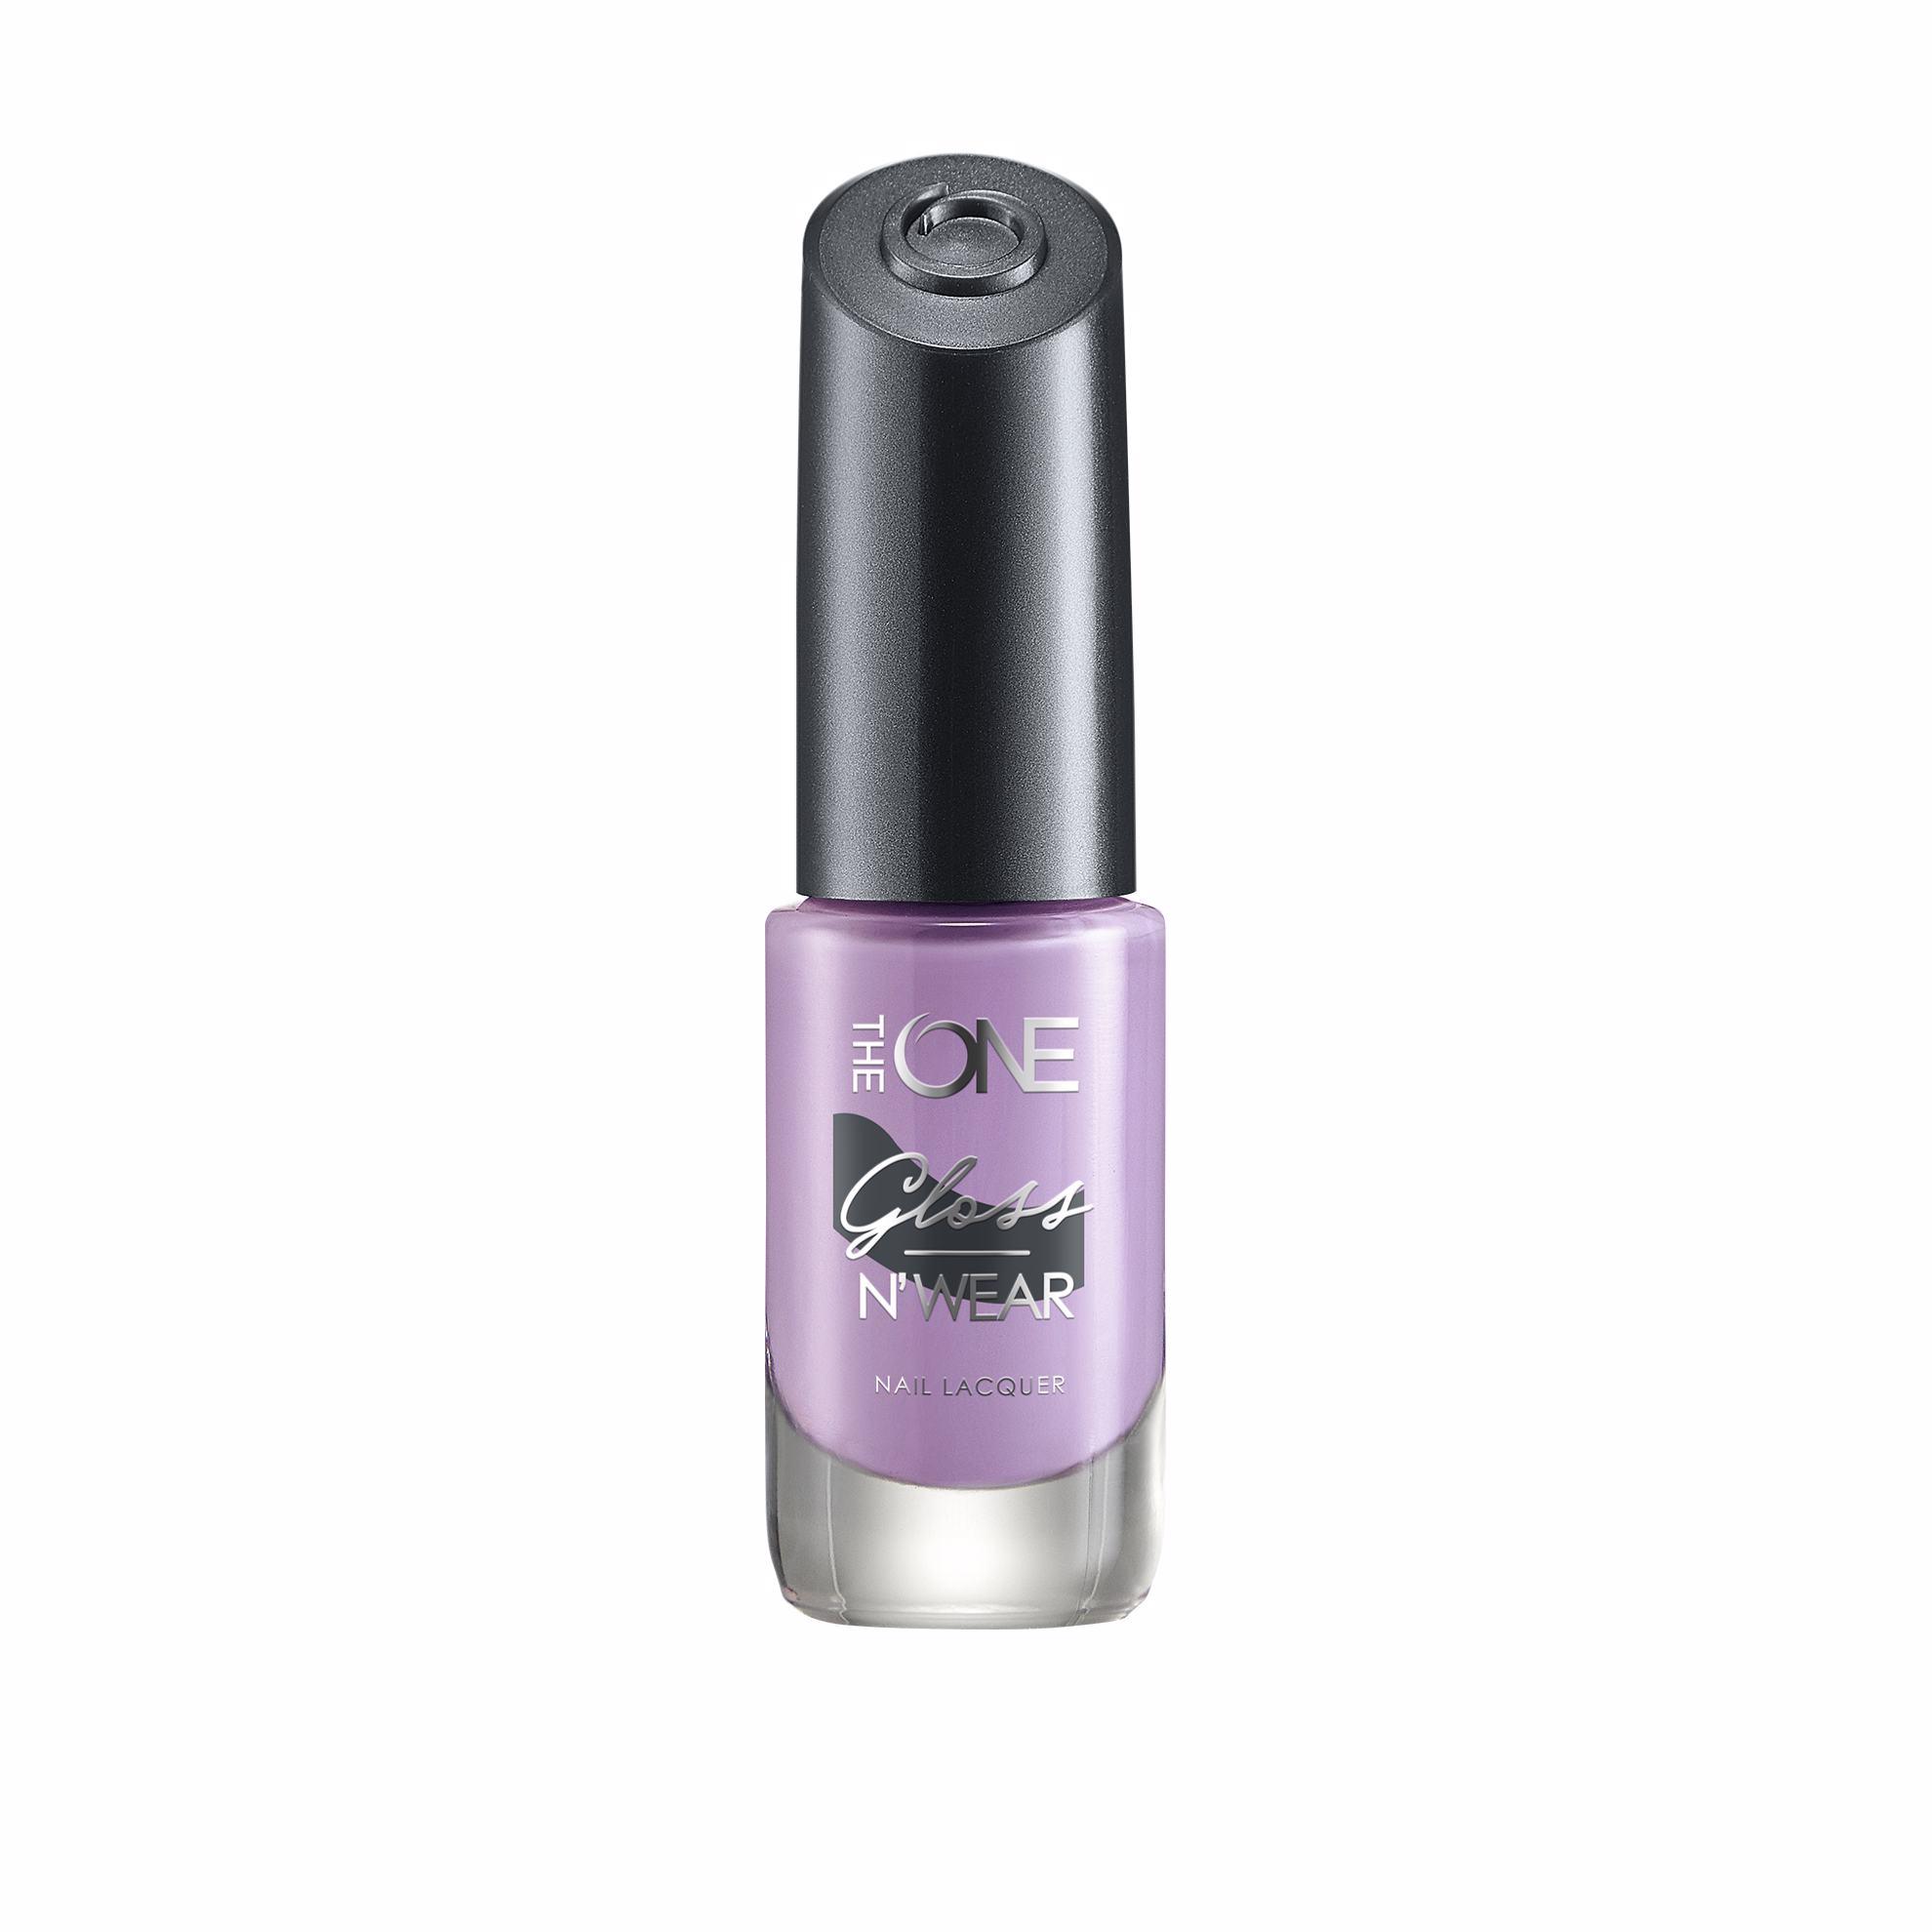 Leskly Lak Na Nehty The One 35558 Laky Na Nehty Dekorativni Kosmetika Oriflame Cosmetics